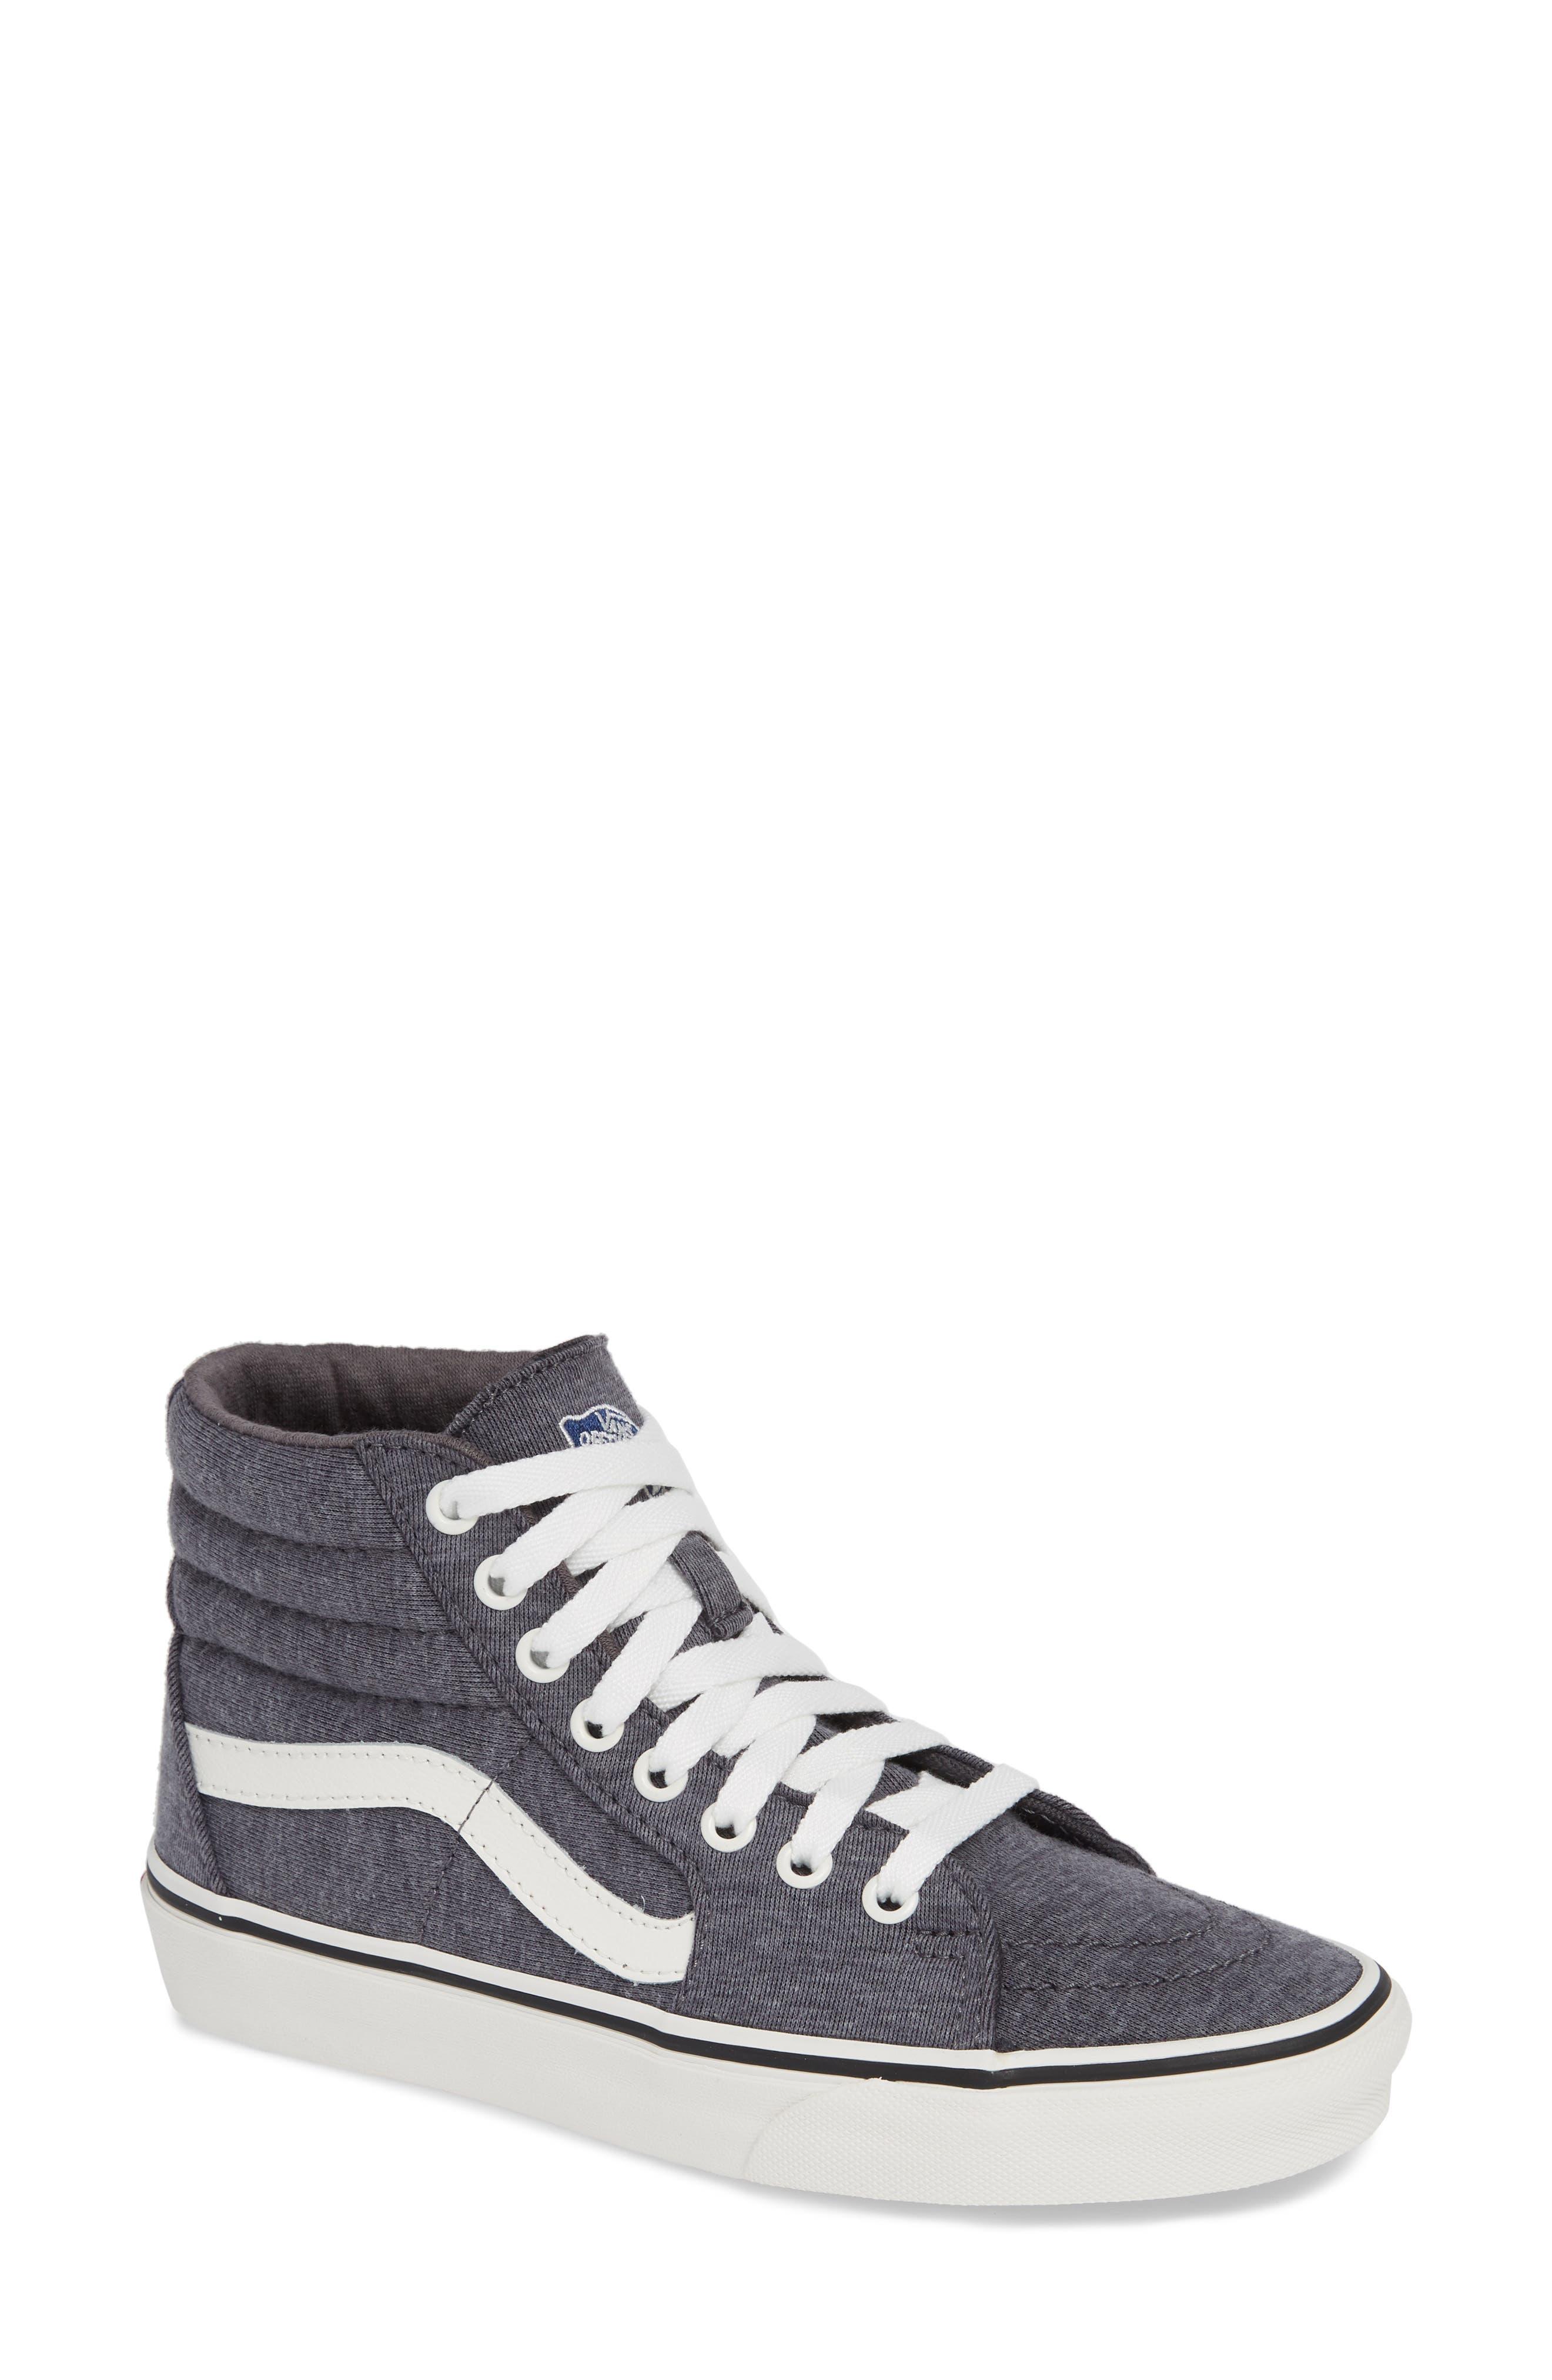 'Sk8-Hi' Sneaker,                         Main,                         color, GREY/ SNOW WHITE